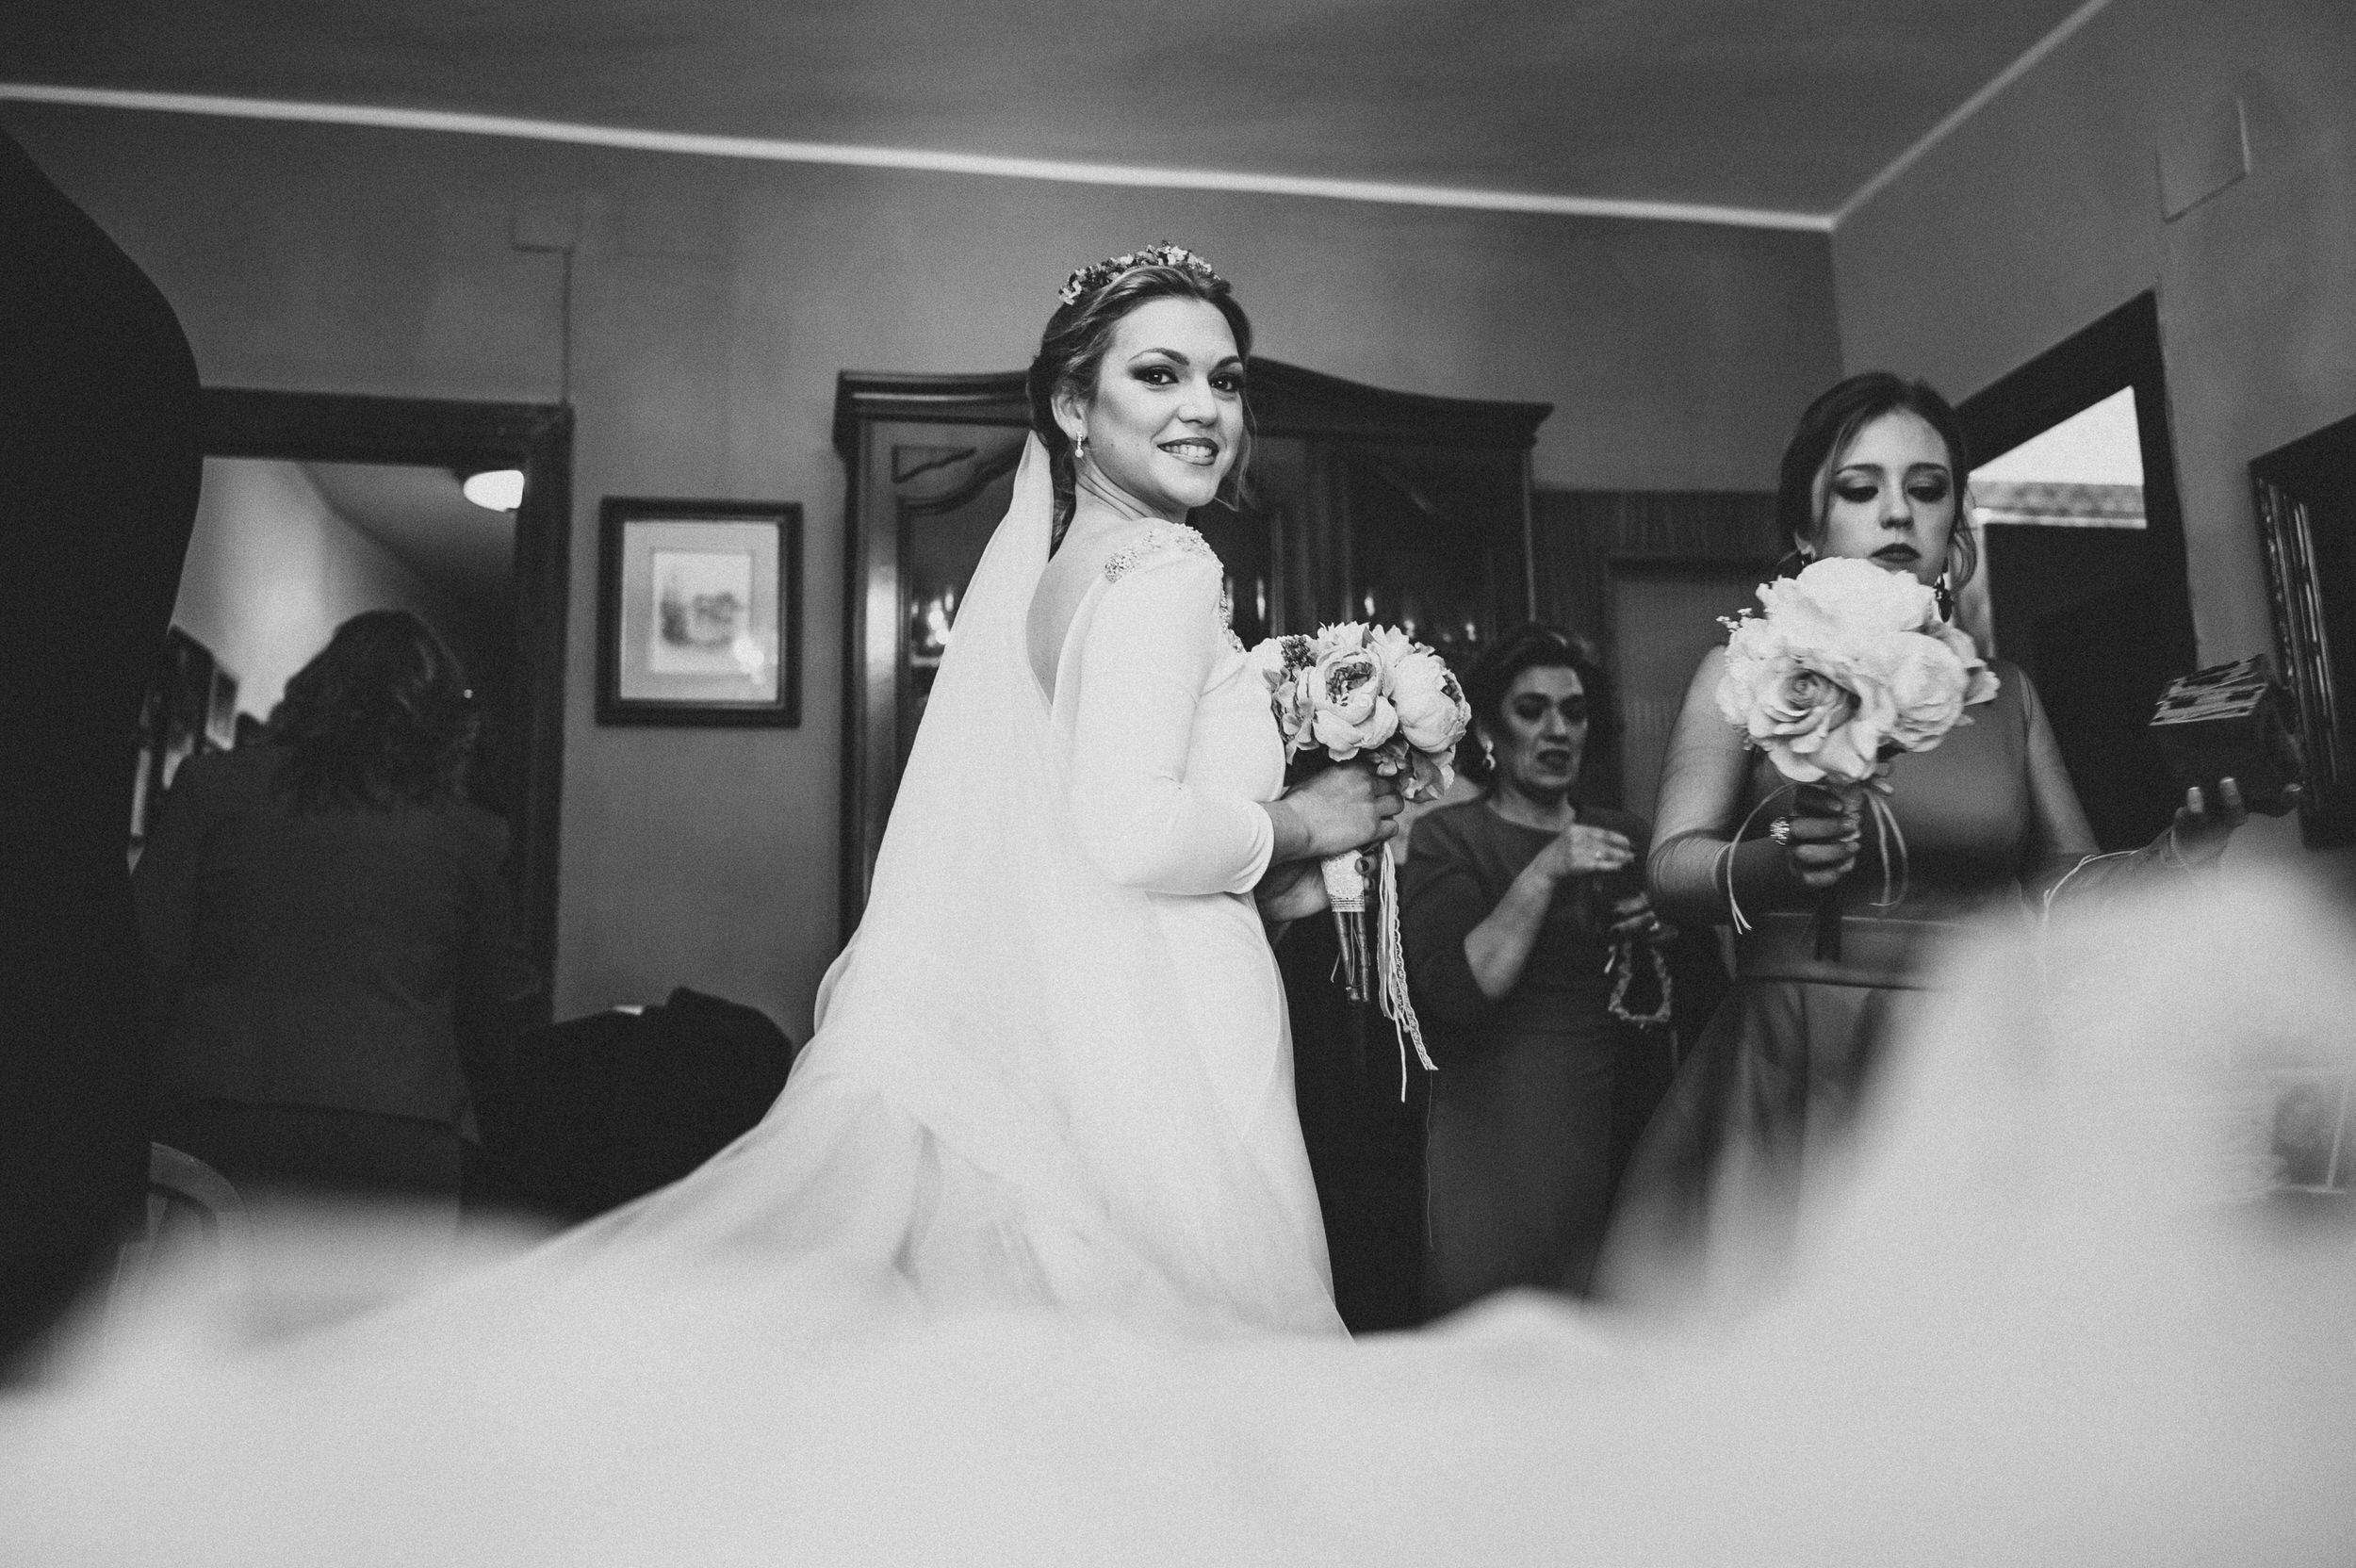 Cristina & Jero - Boda en Ecija - Iglesia Santa Ana - Fotógrafo Andrés Amarillo (15).JPG